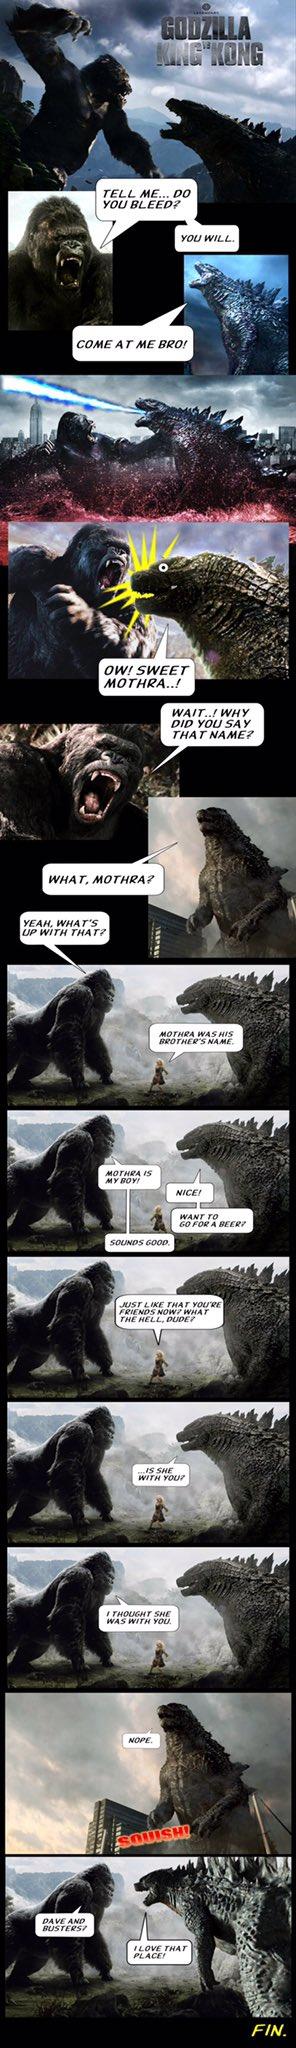 Godzilla vs King Kong Mothra meme by Paul Gale Network